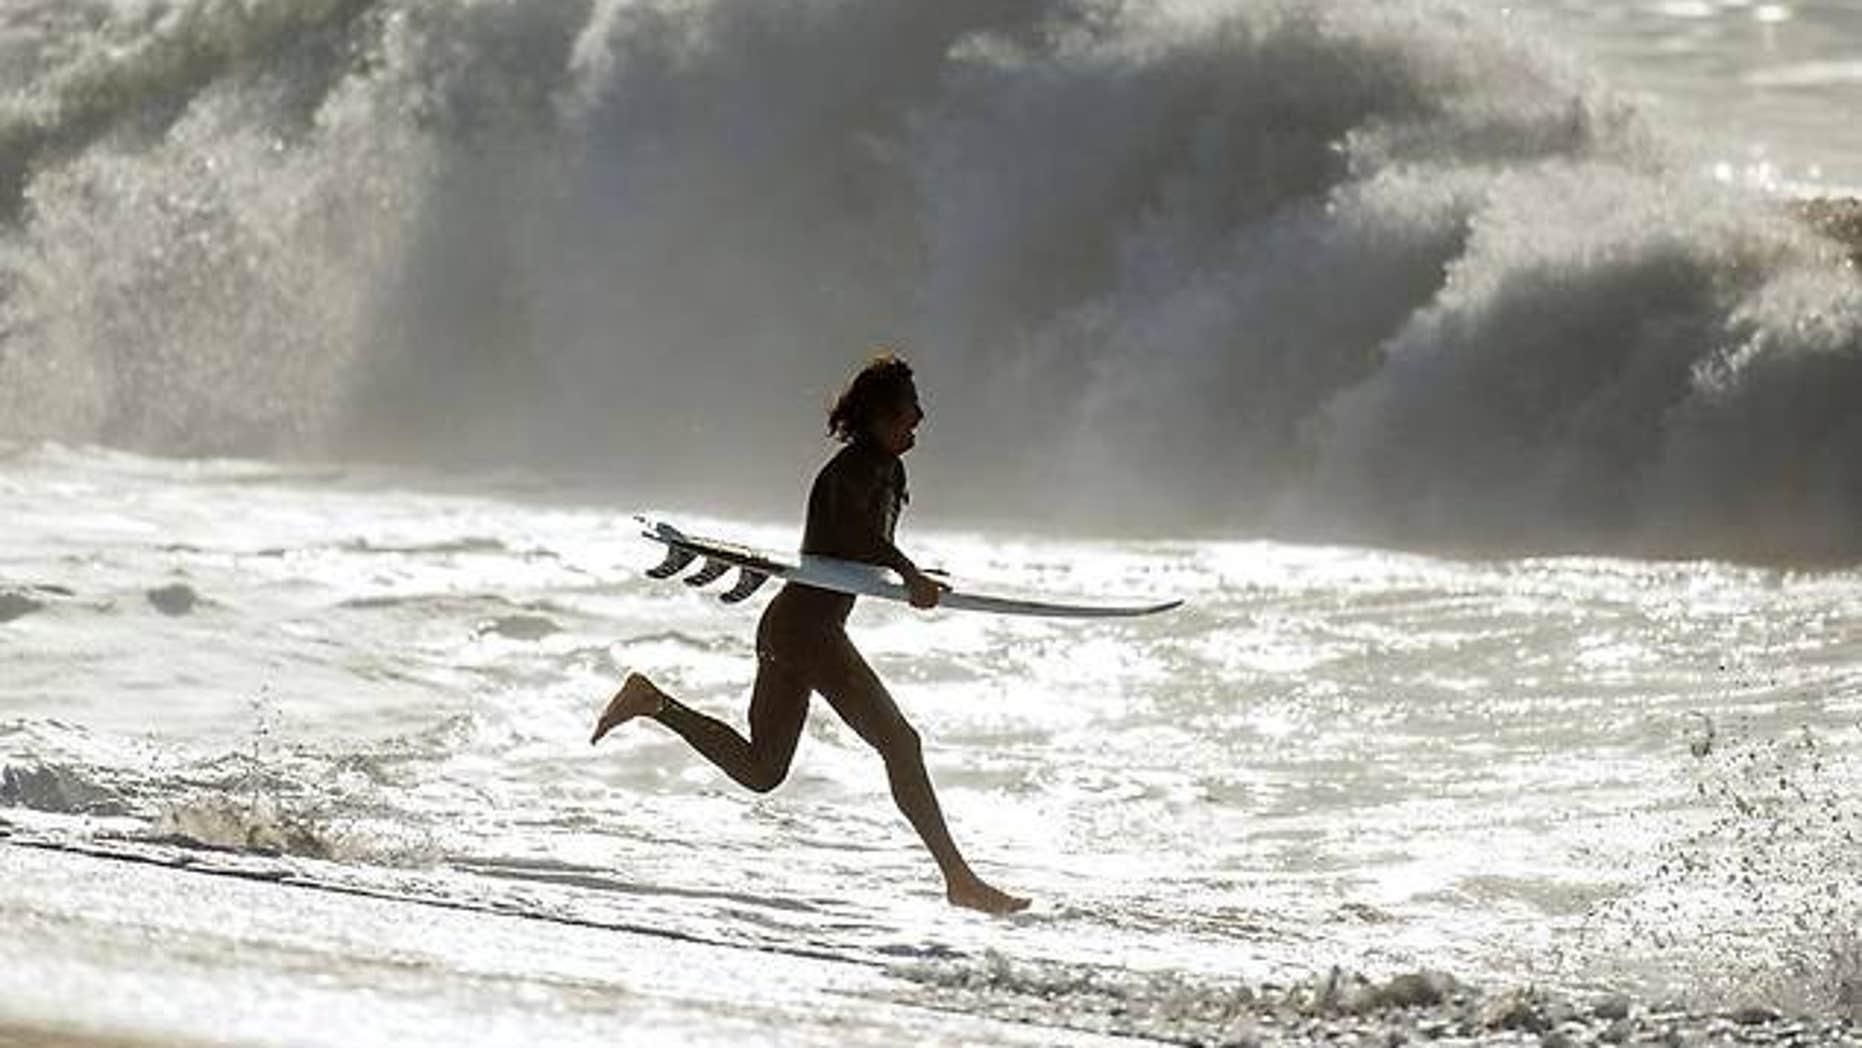 A surfer runs into the ocean at Seal Beach, Calif. on Thursday.